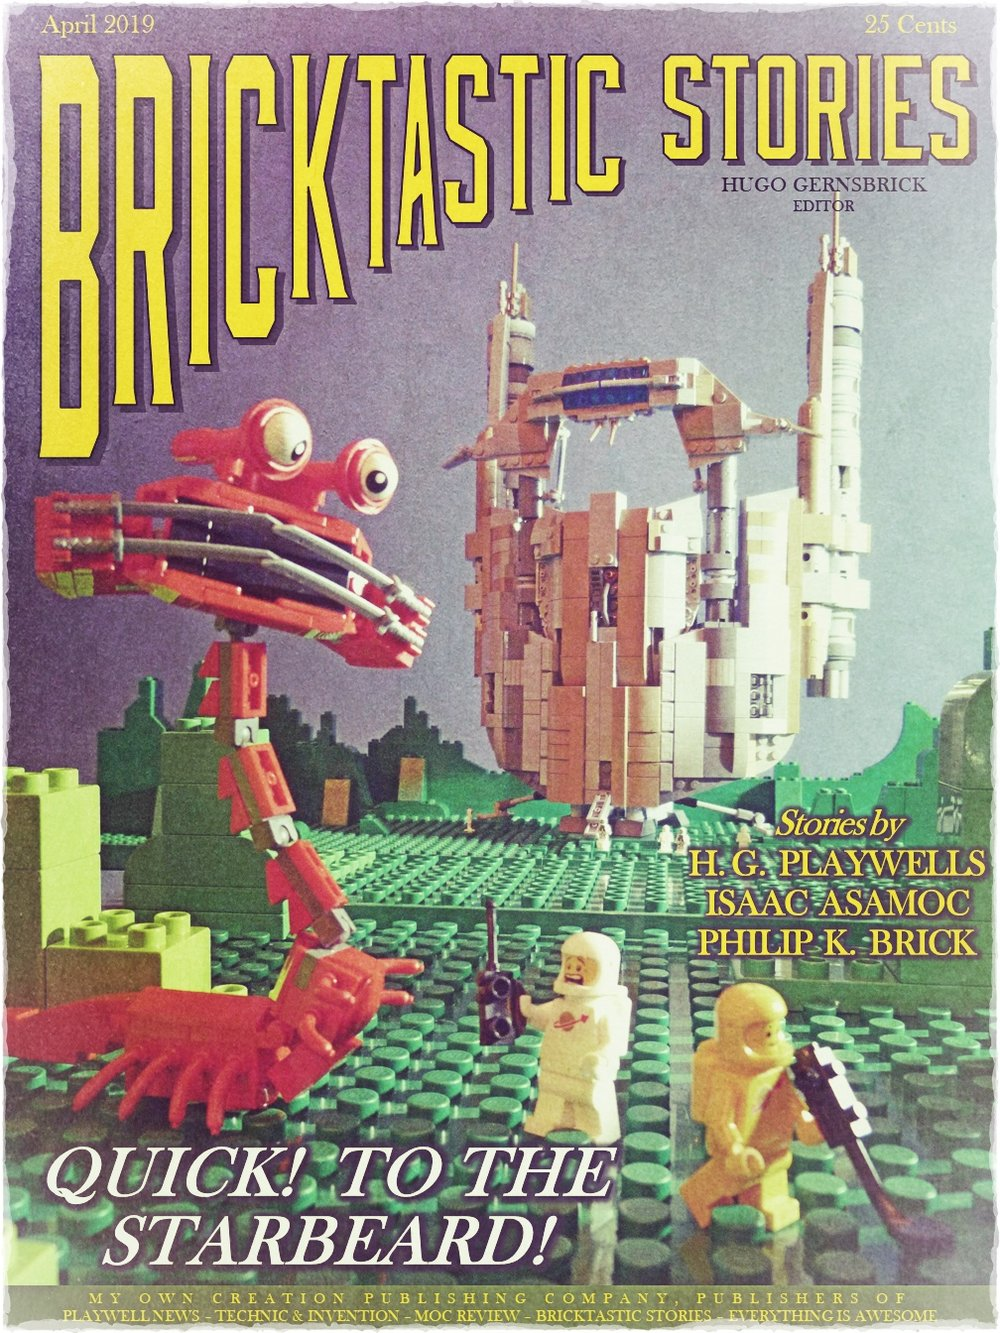 Bricktastic Stories.jpg